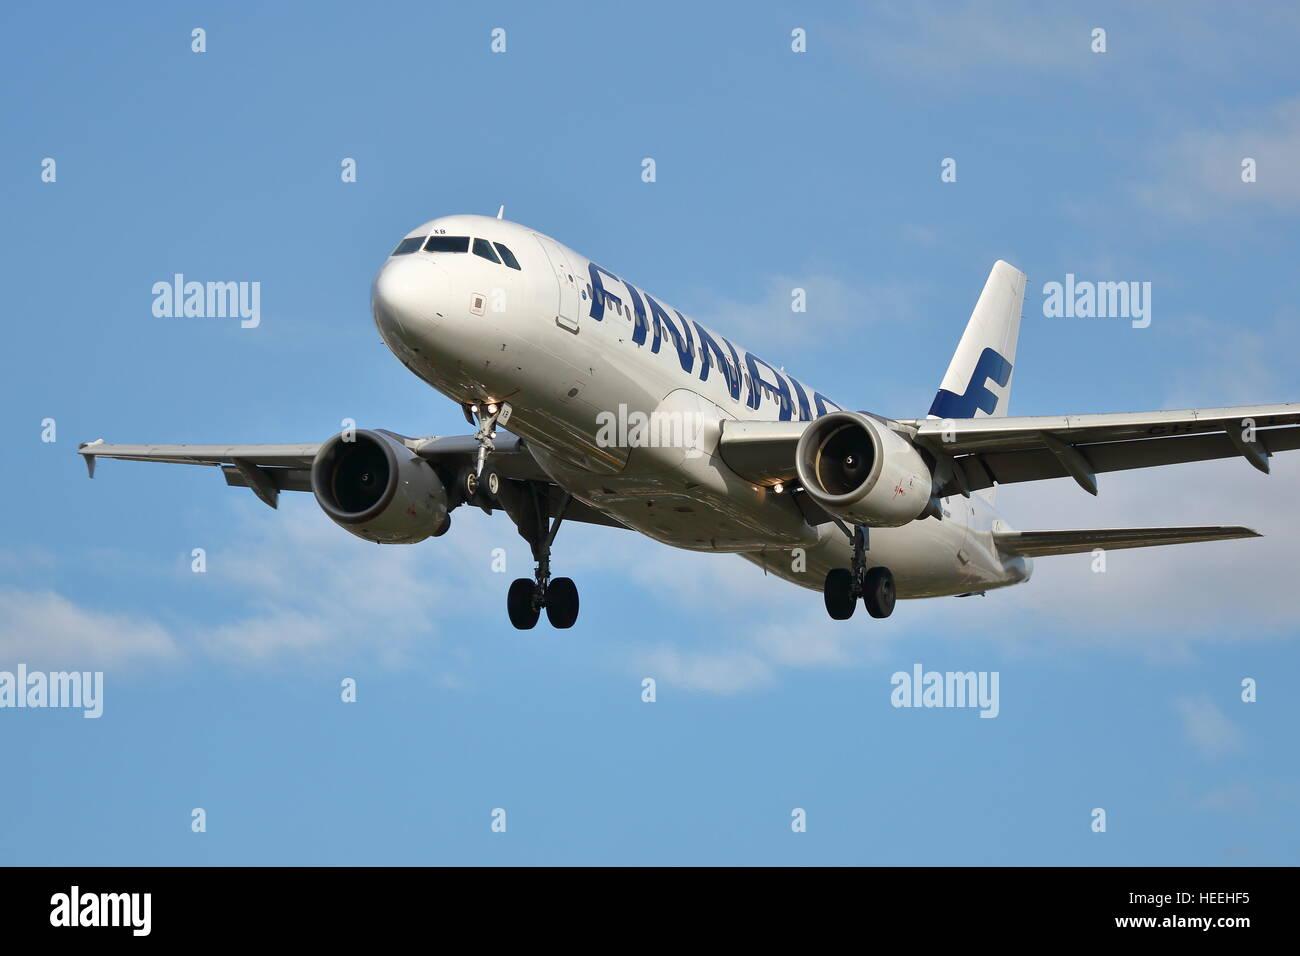 Finnair Airbus A320-200 OH-LXB landing at Heathrow Airport, London - Stock Image